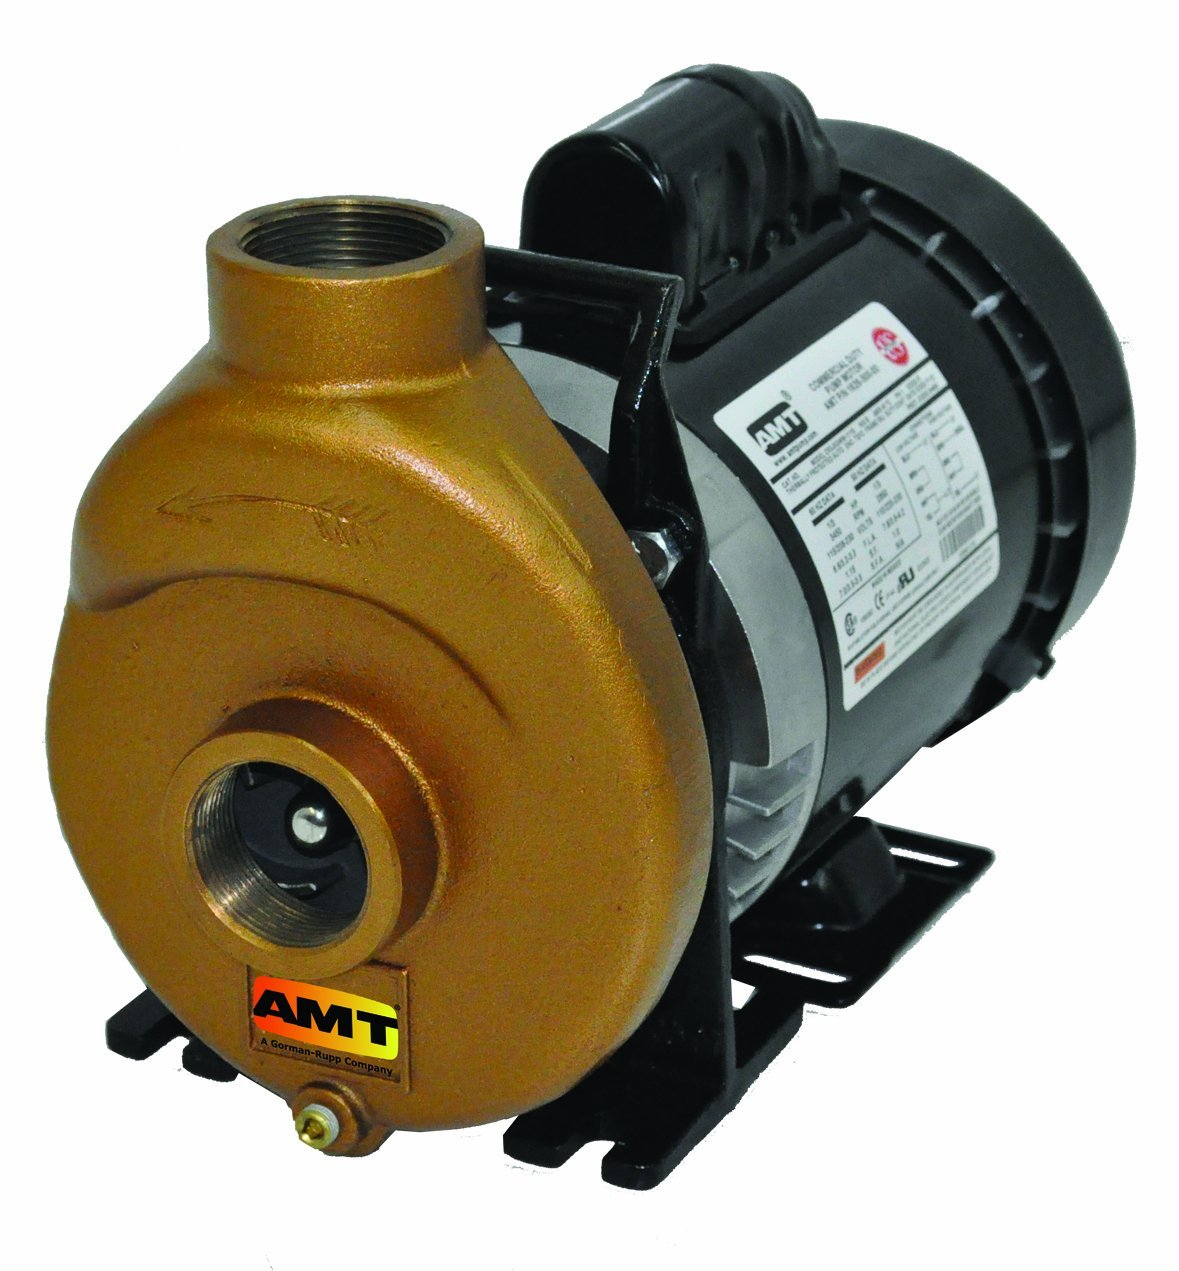 "AMT 388J-97 1.5"" Bronze Self-Priming Inline Centrifugal Pump, Buna-N/SS Seal, 1-1/2hp TEFC Motor"